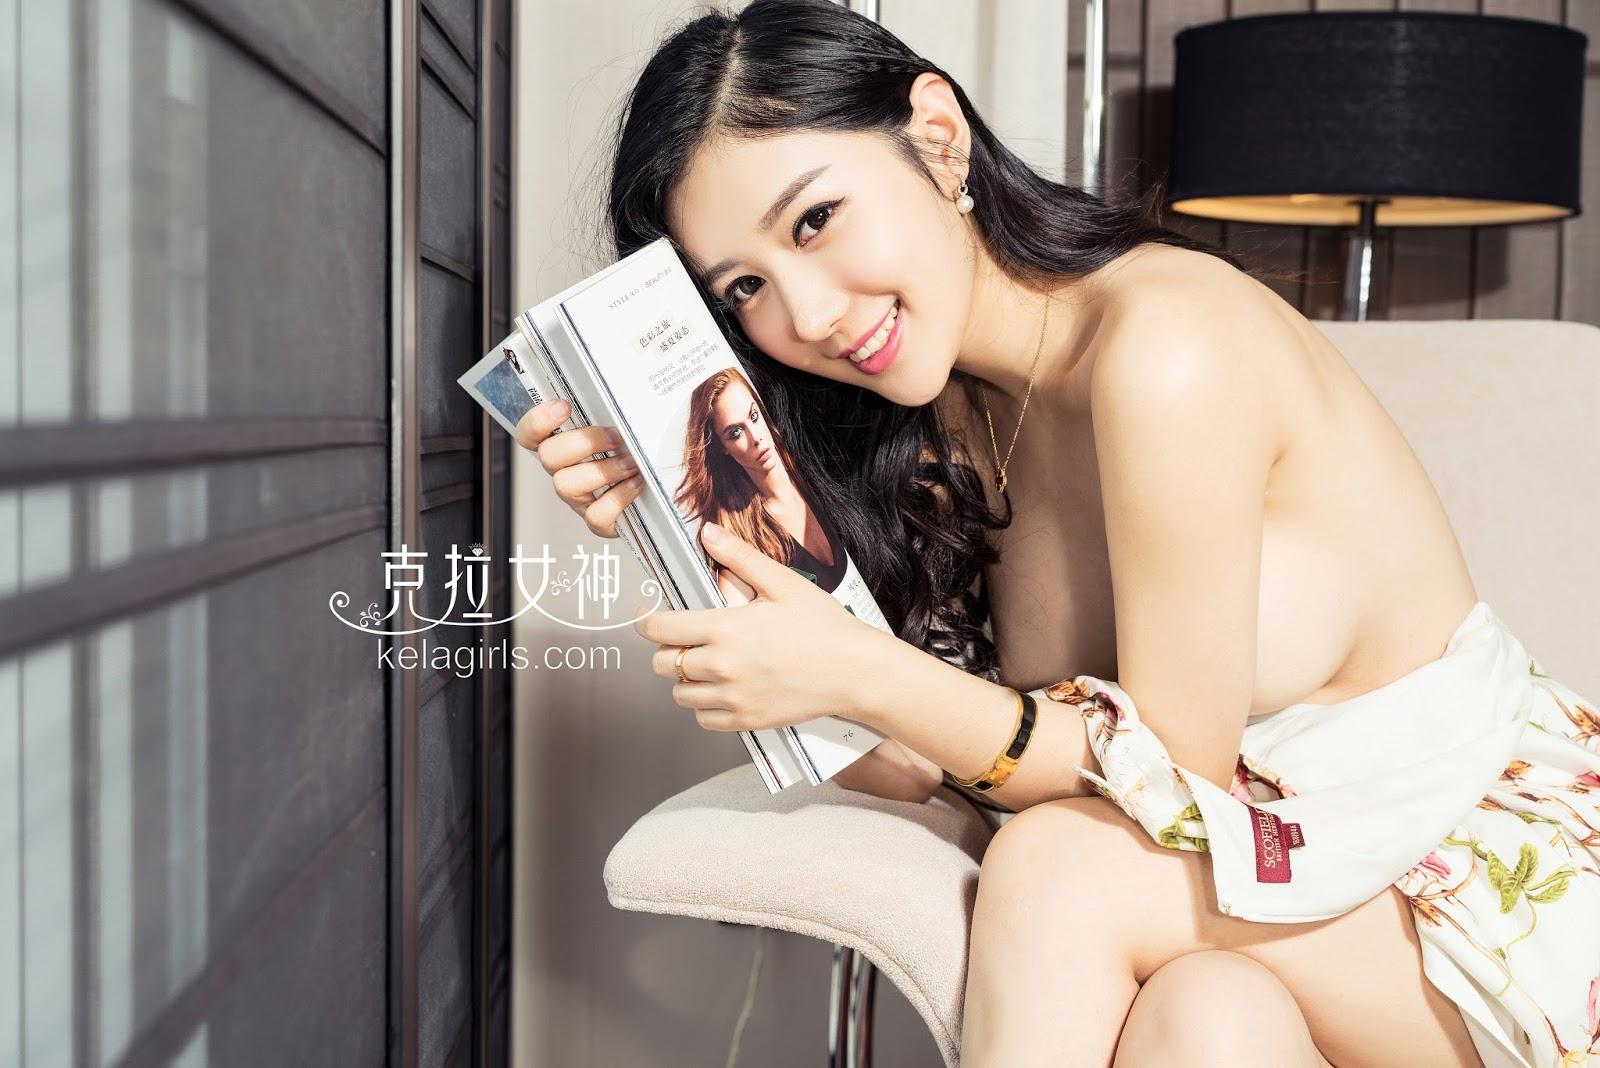 KelaGirls 2017-03-10 Gao Zi Xuan